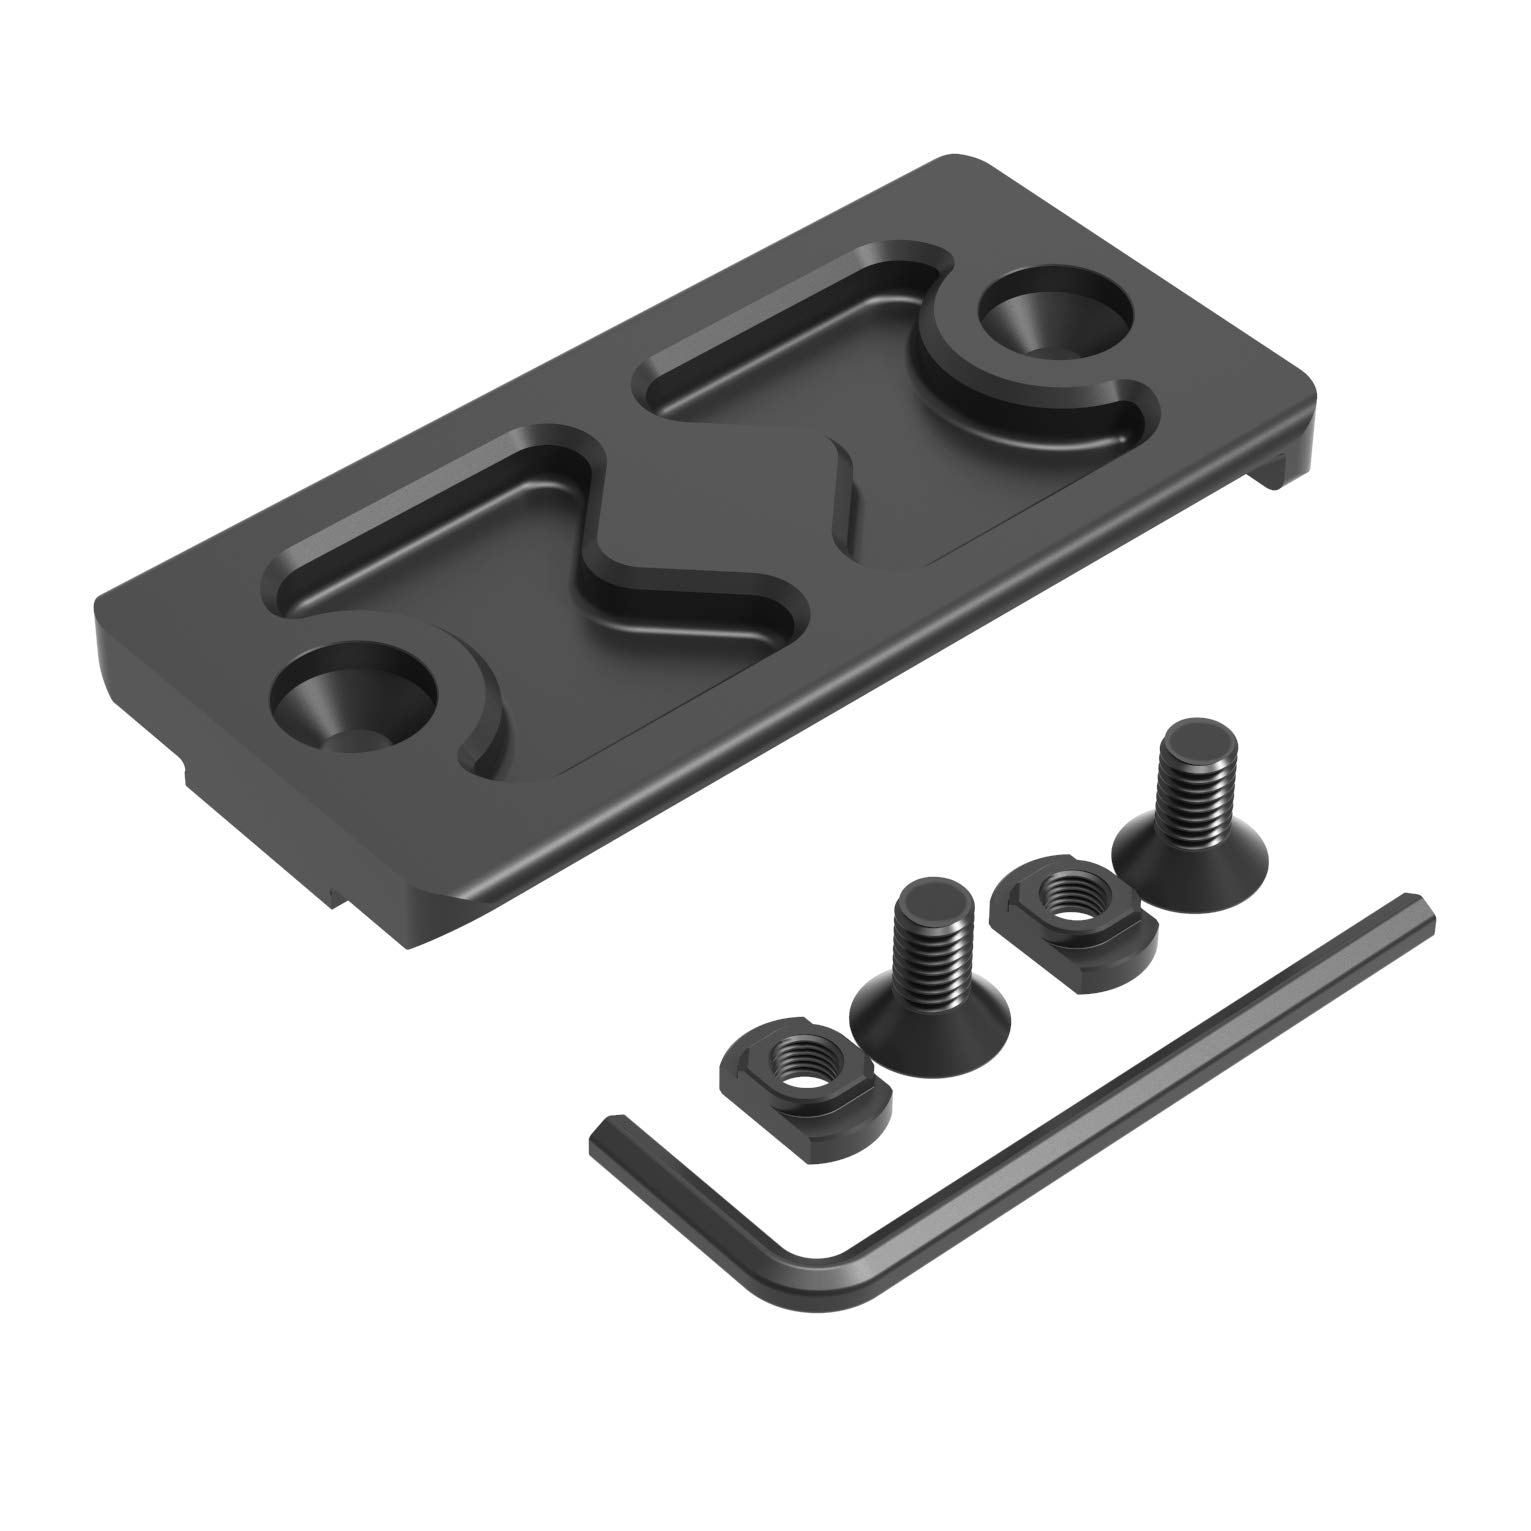 Tough Tactical Tools M-LOK Arca-Swiss Rail Adapter, RRS Tripod Dovetail Adapter (MLOK)